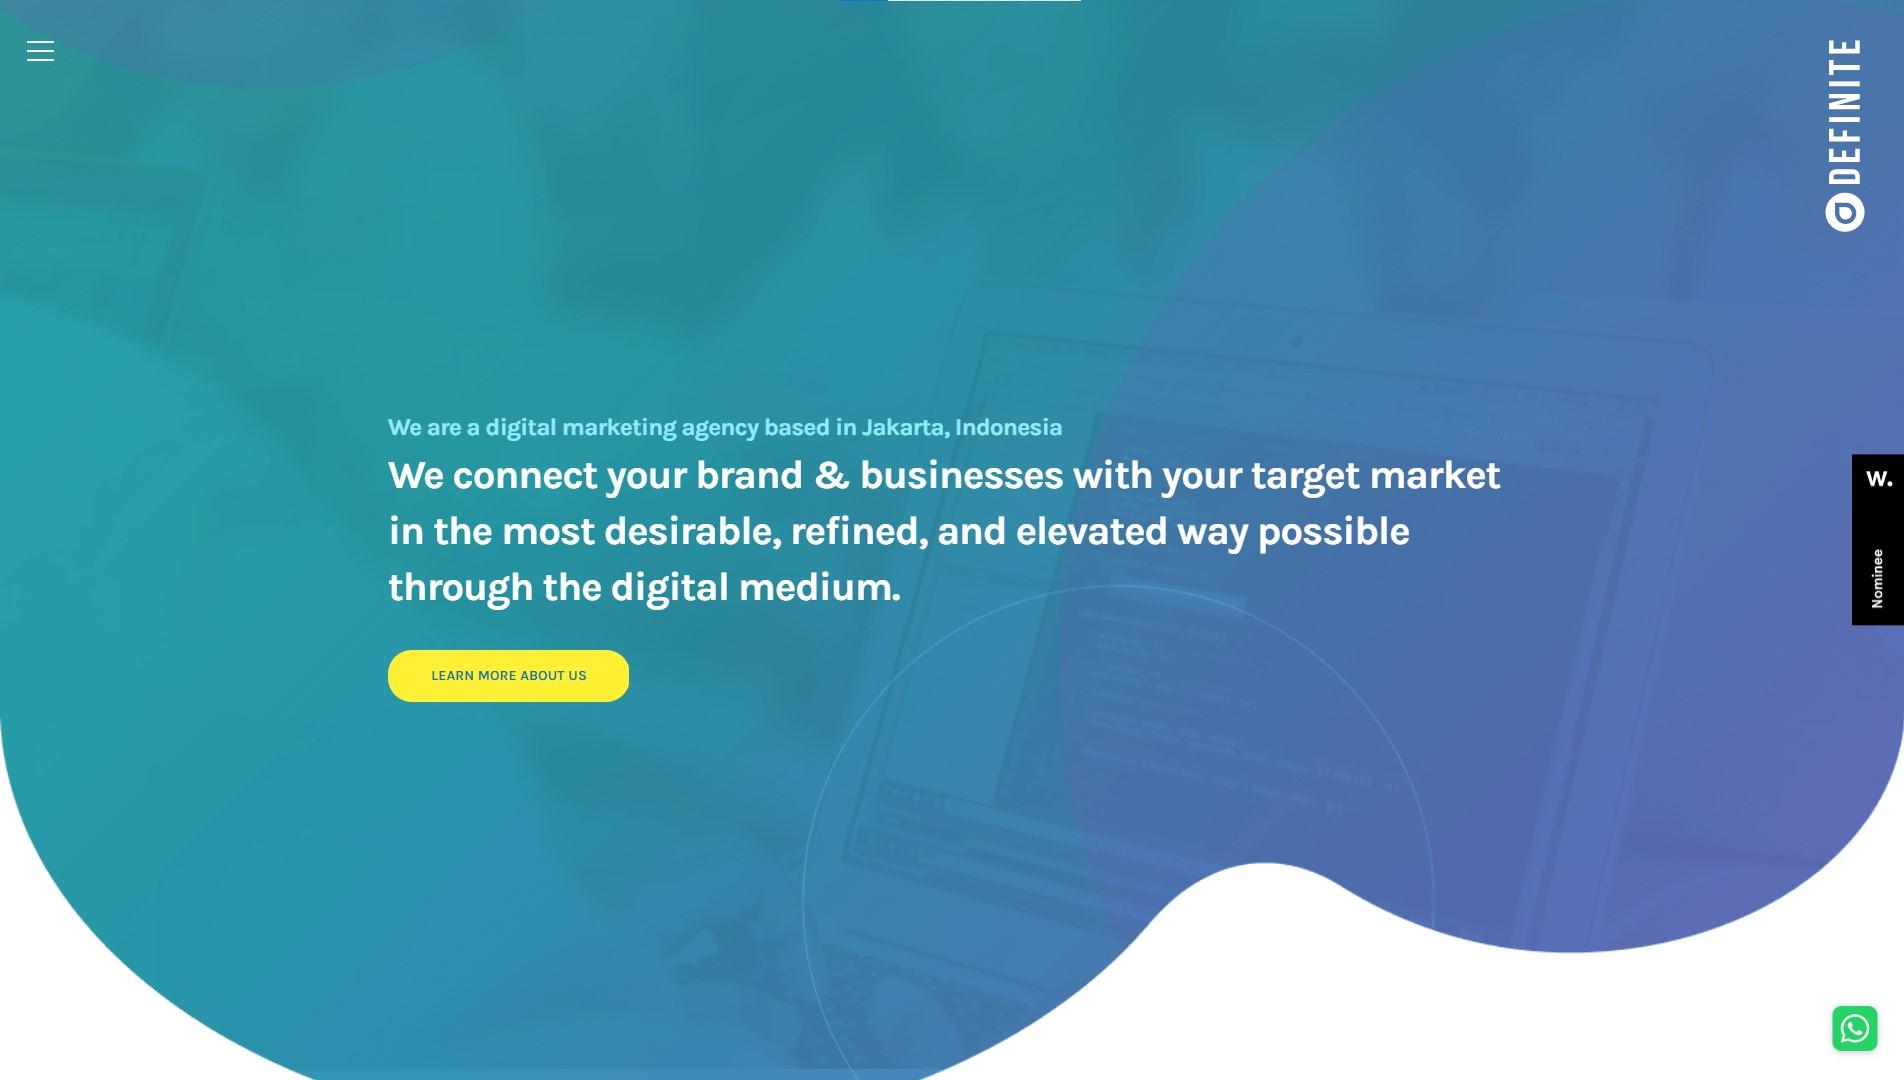 Orpetron Web Design Awards - Definite - Web Design Awards Inspiration Trends UI UX